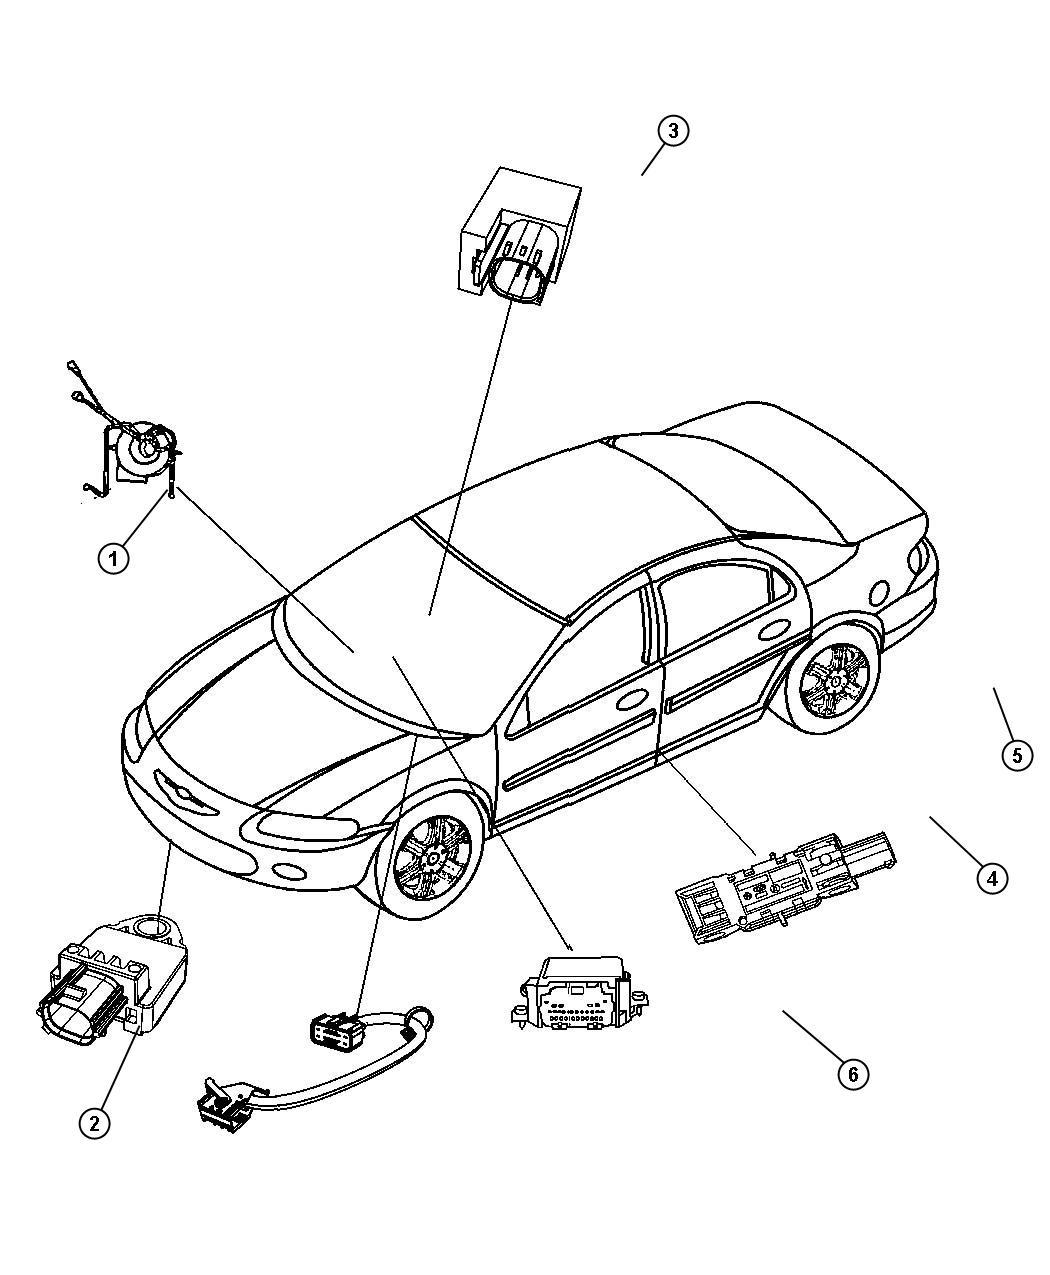 Chrysler 200 Module Air Bag Control Occupant